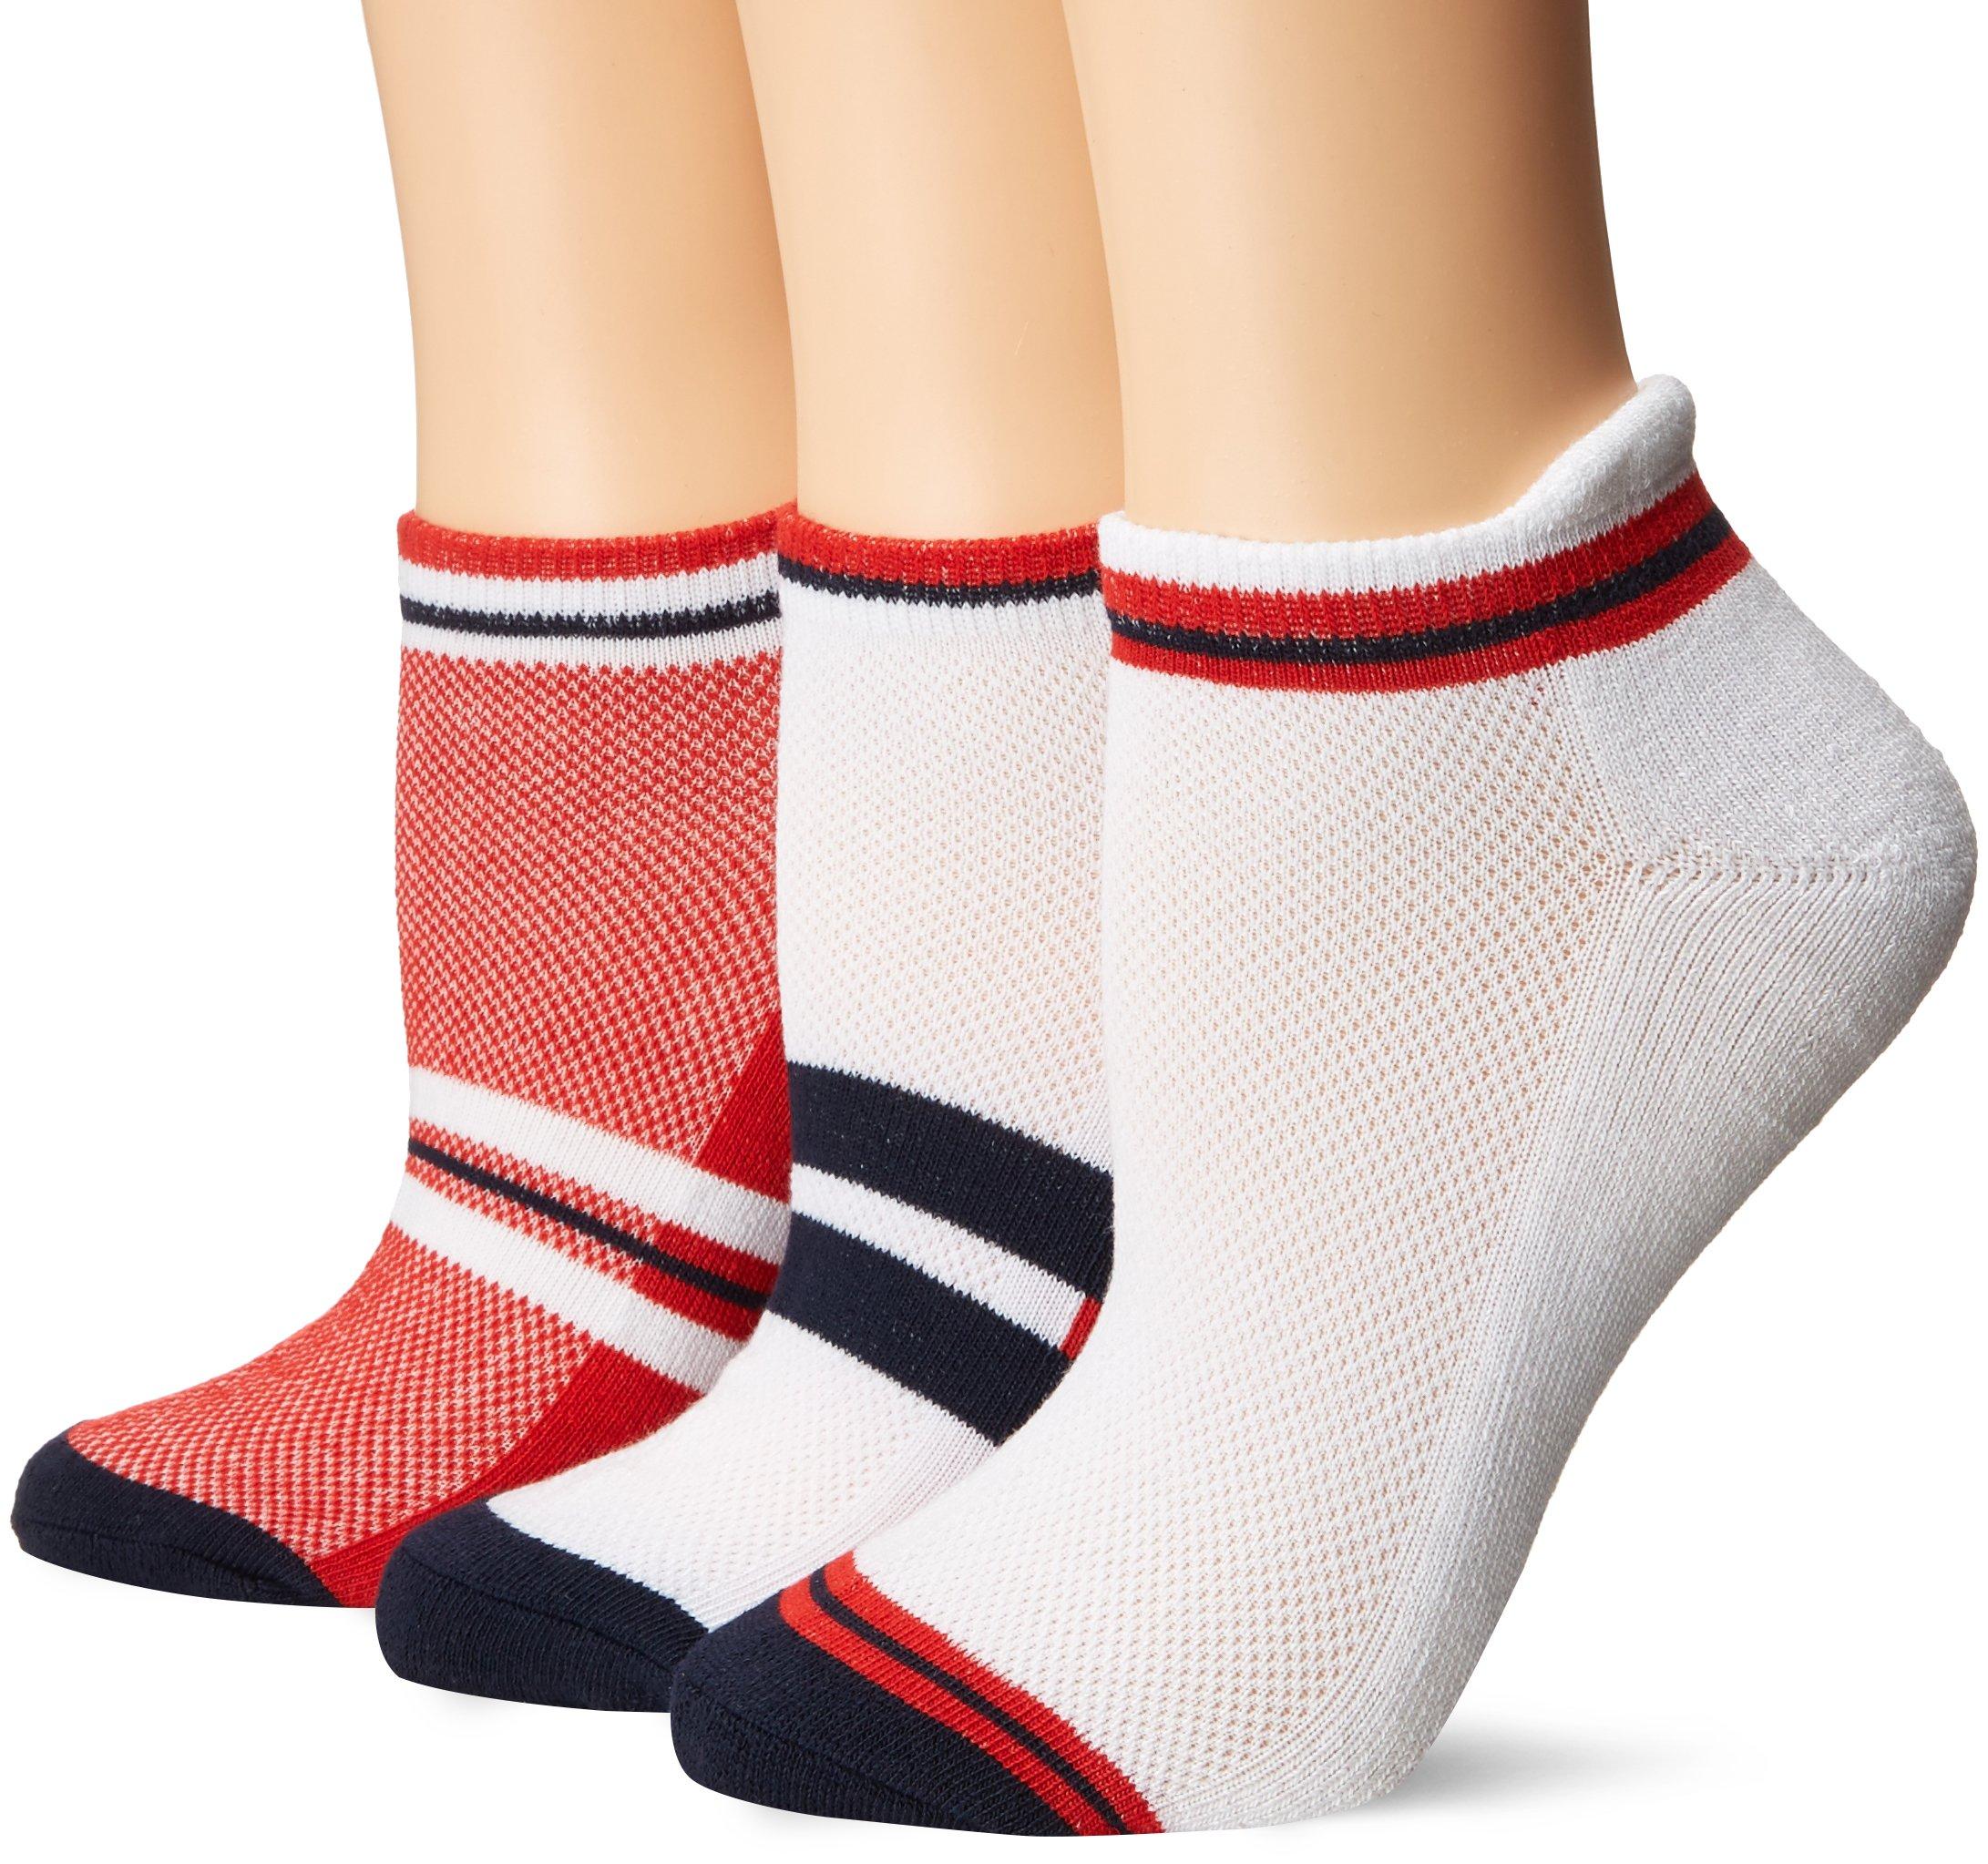 LPGA socks & Legwear Womens LPGA Color Collection 3-Pair-White/Red/Blue-9 to 11, Red, 9-11